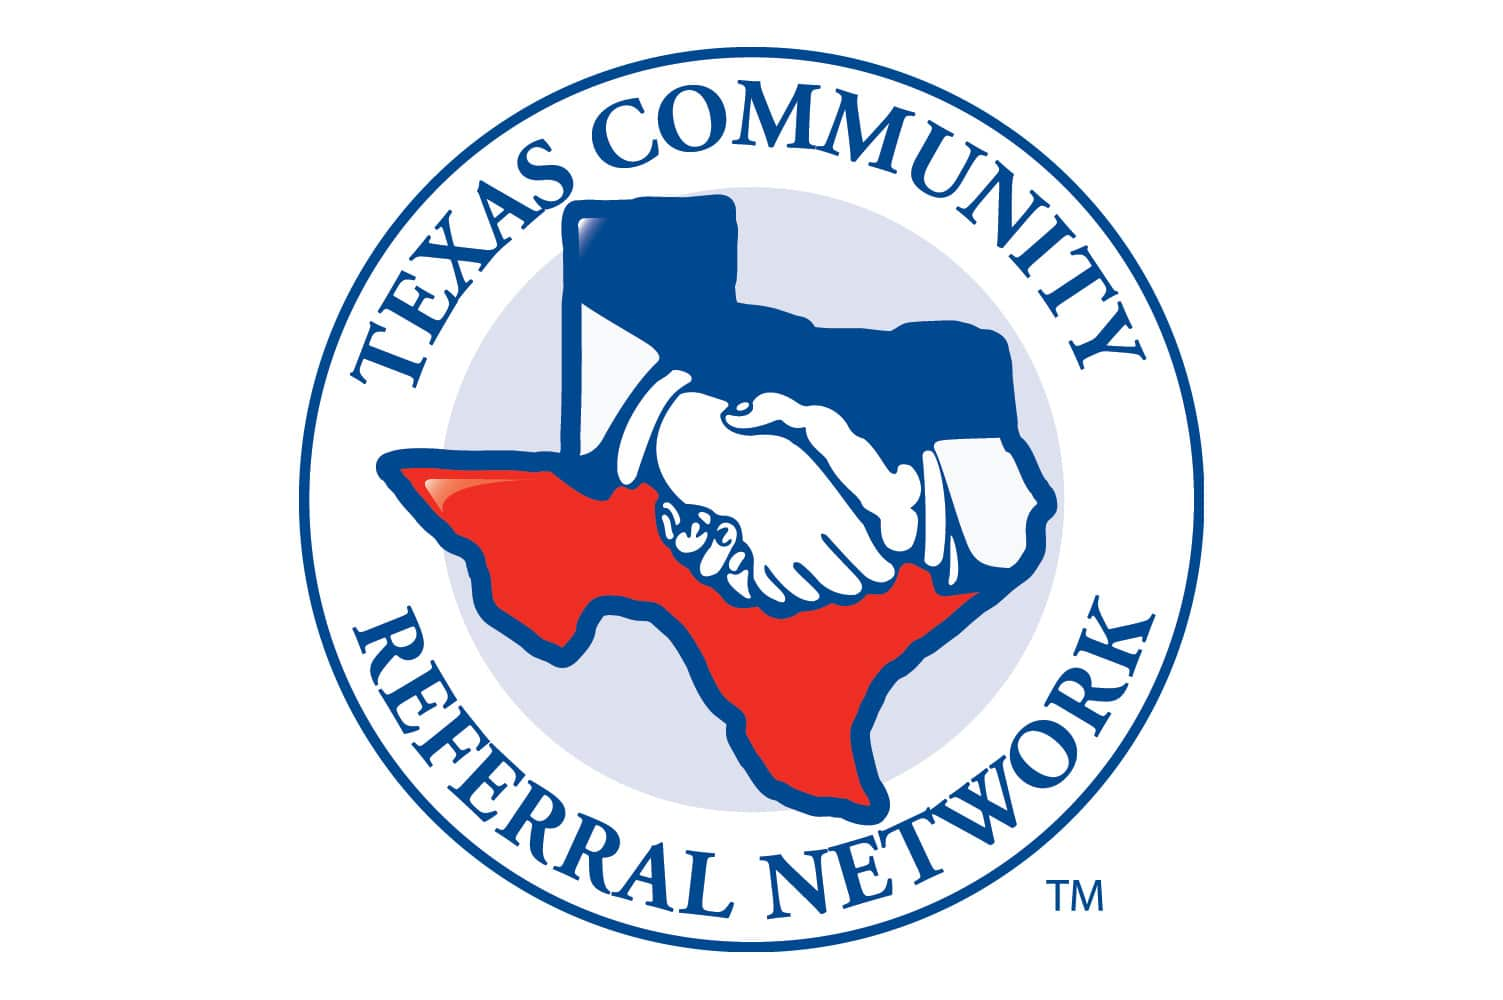 texas-community-referral-network-logo